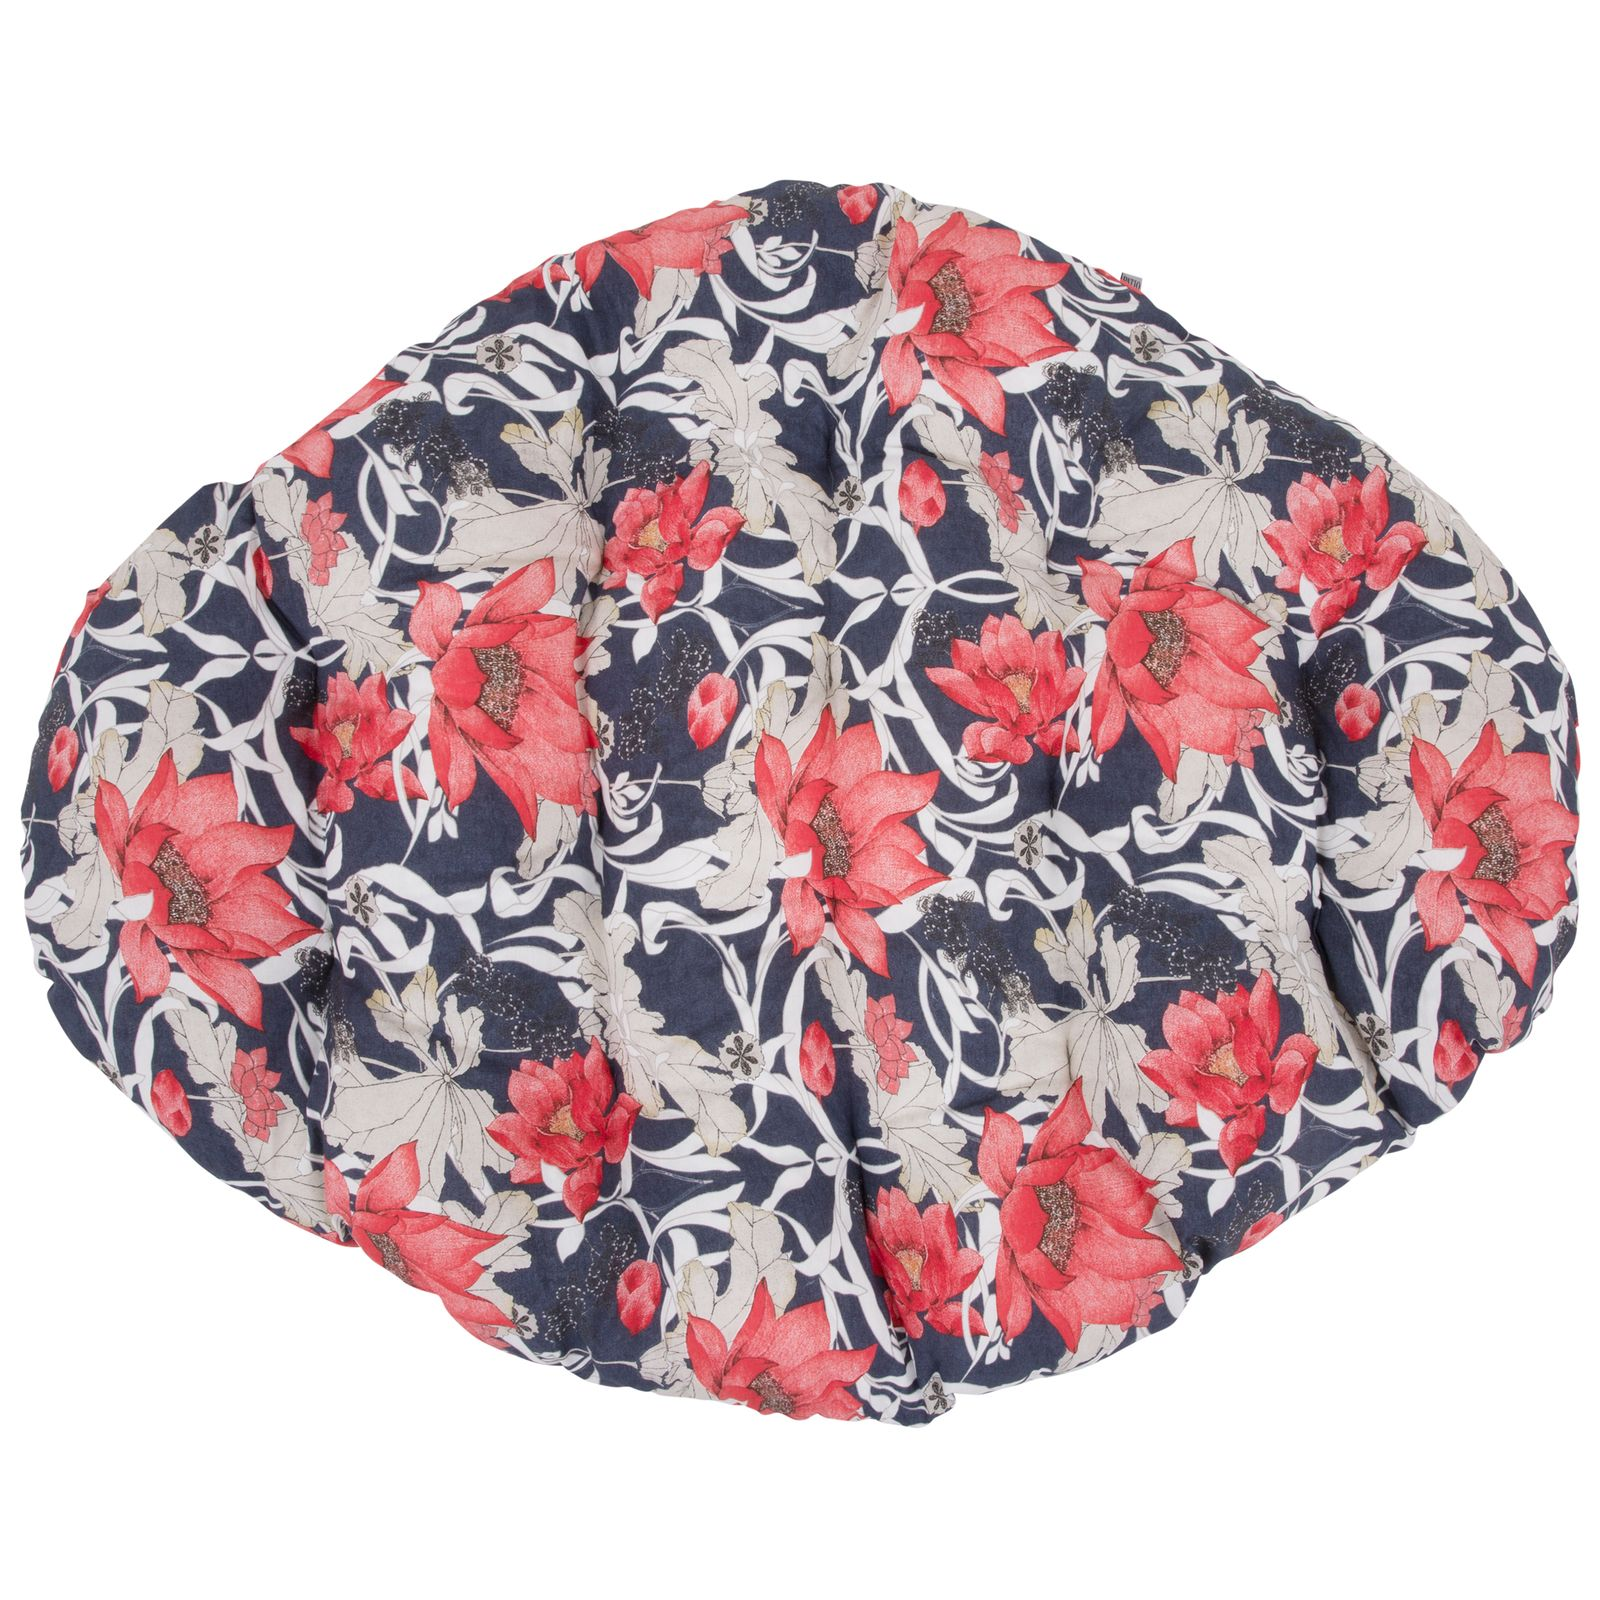 Cuscino ovale per poltrona sospesa A090-03LB 144 x 100/45 x 10/12 cm PATIO